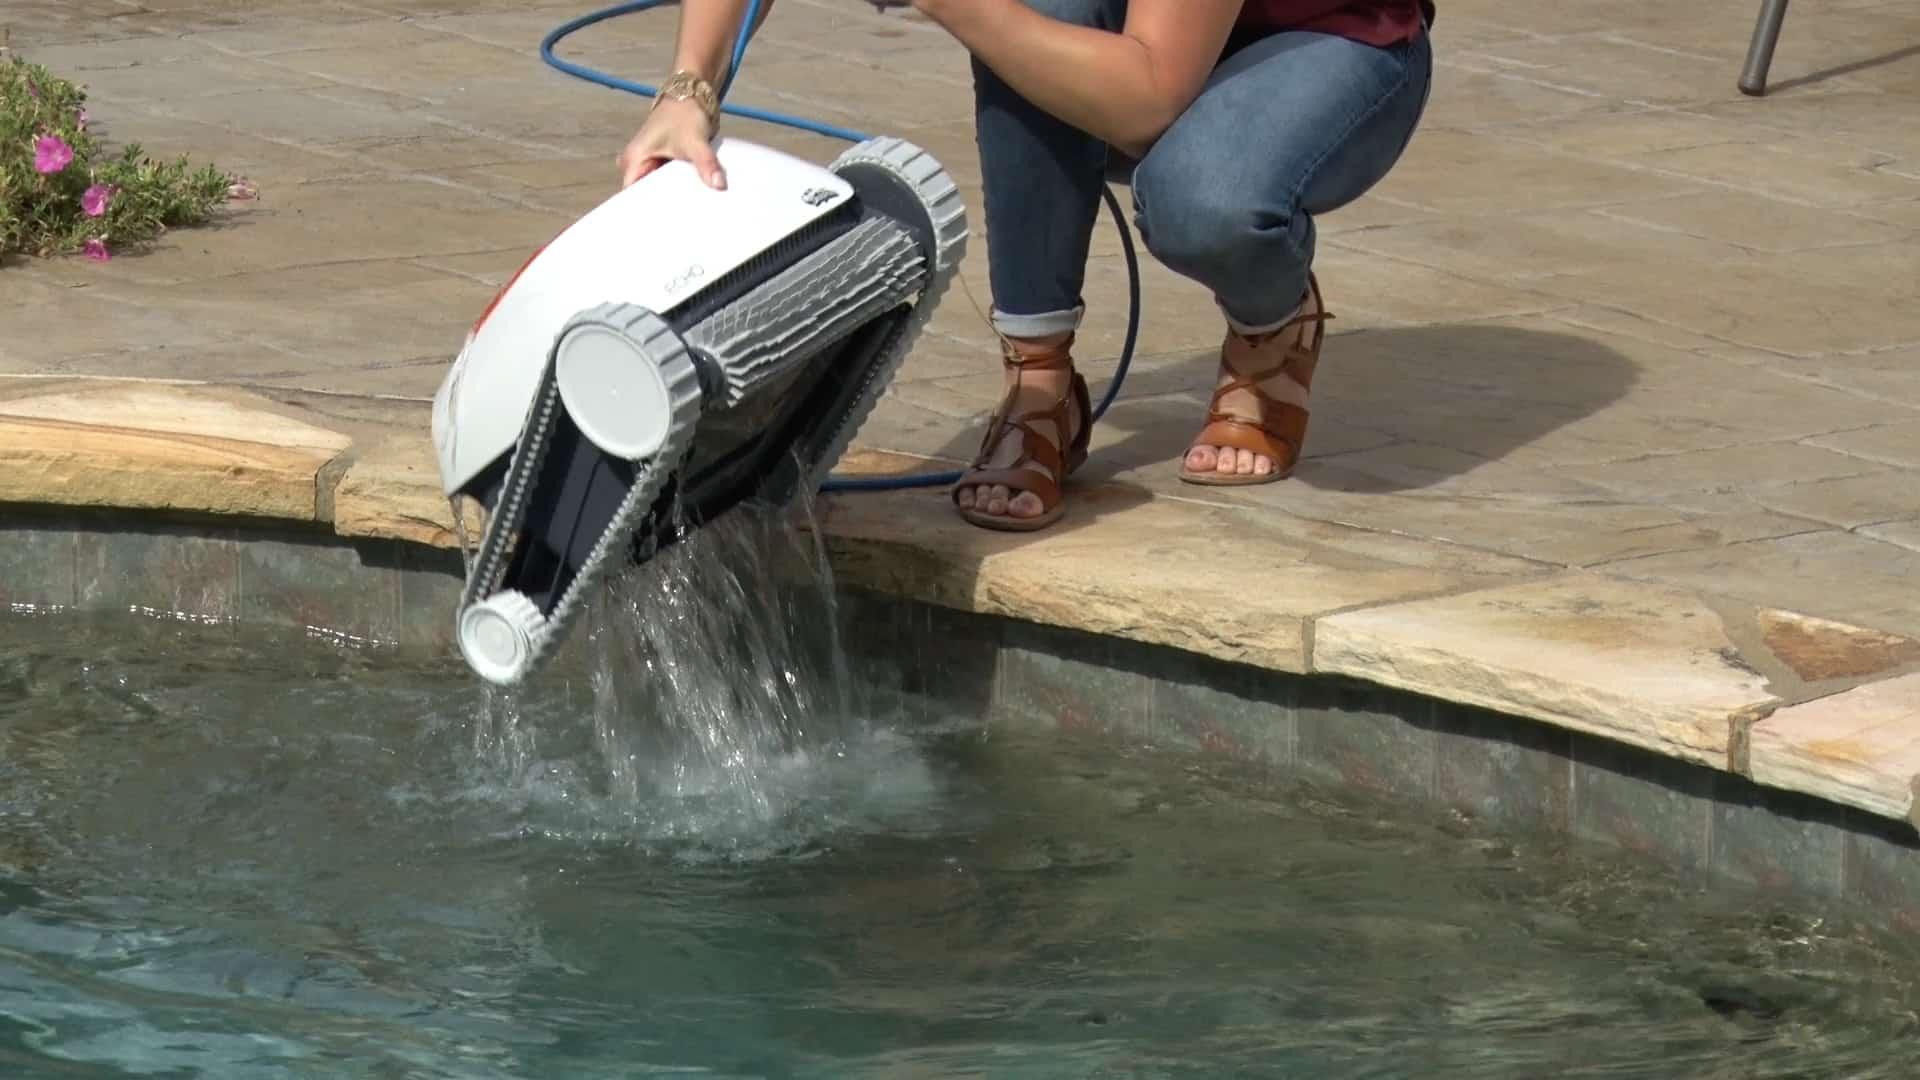 Echo robotic swimming pool cleaner